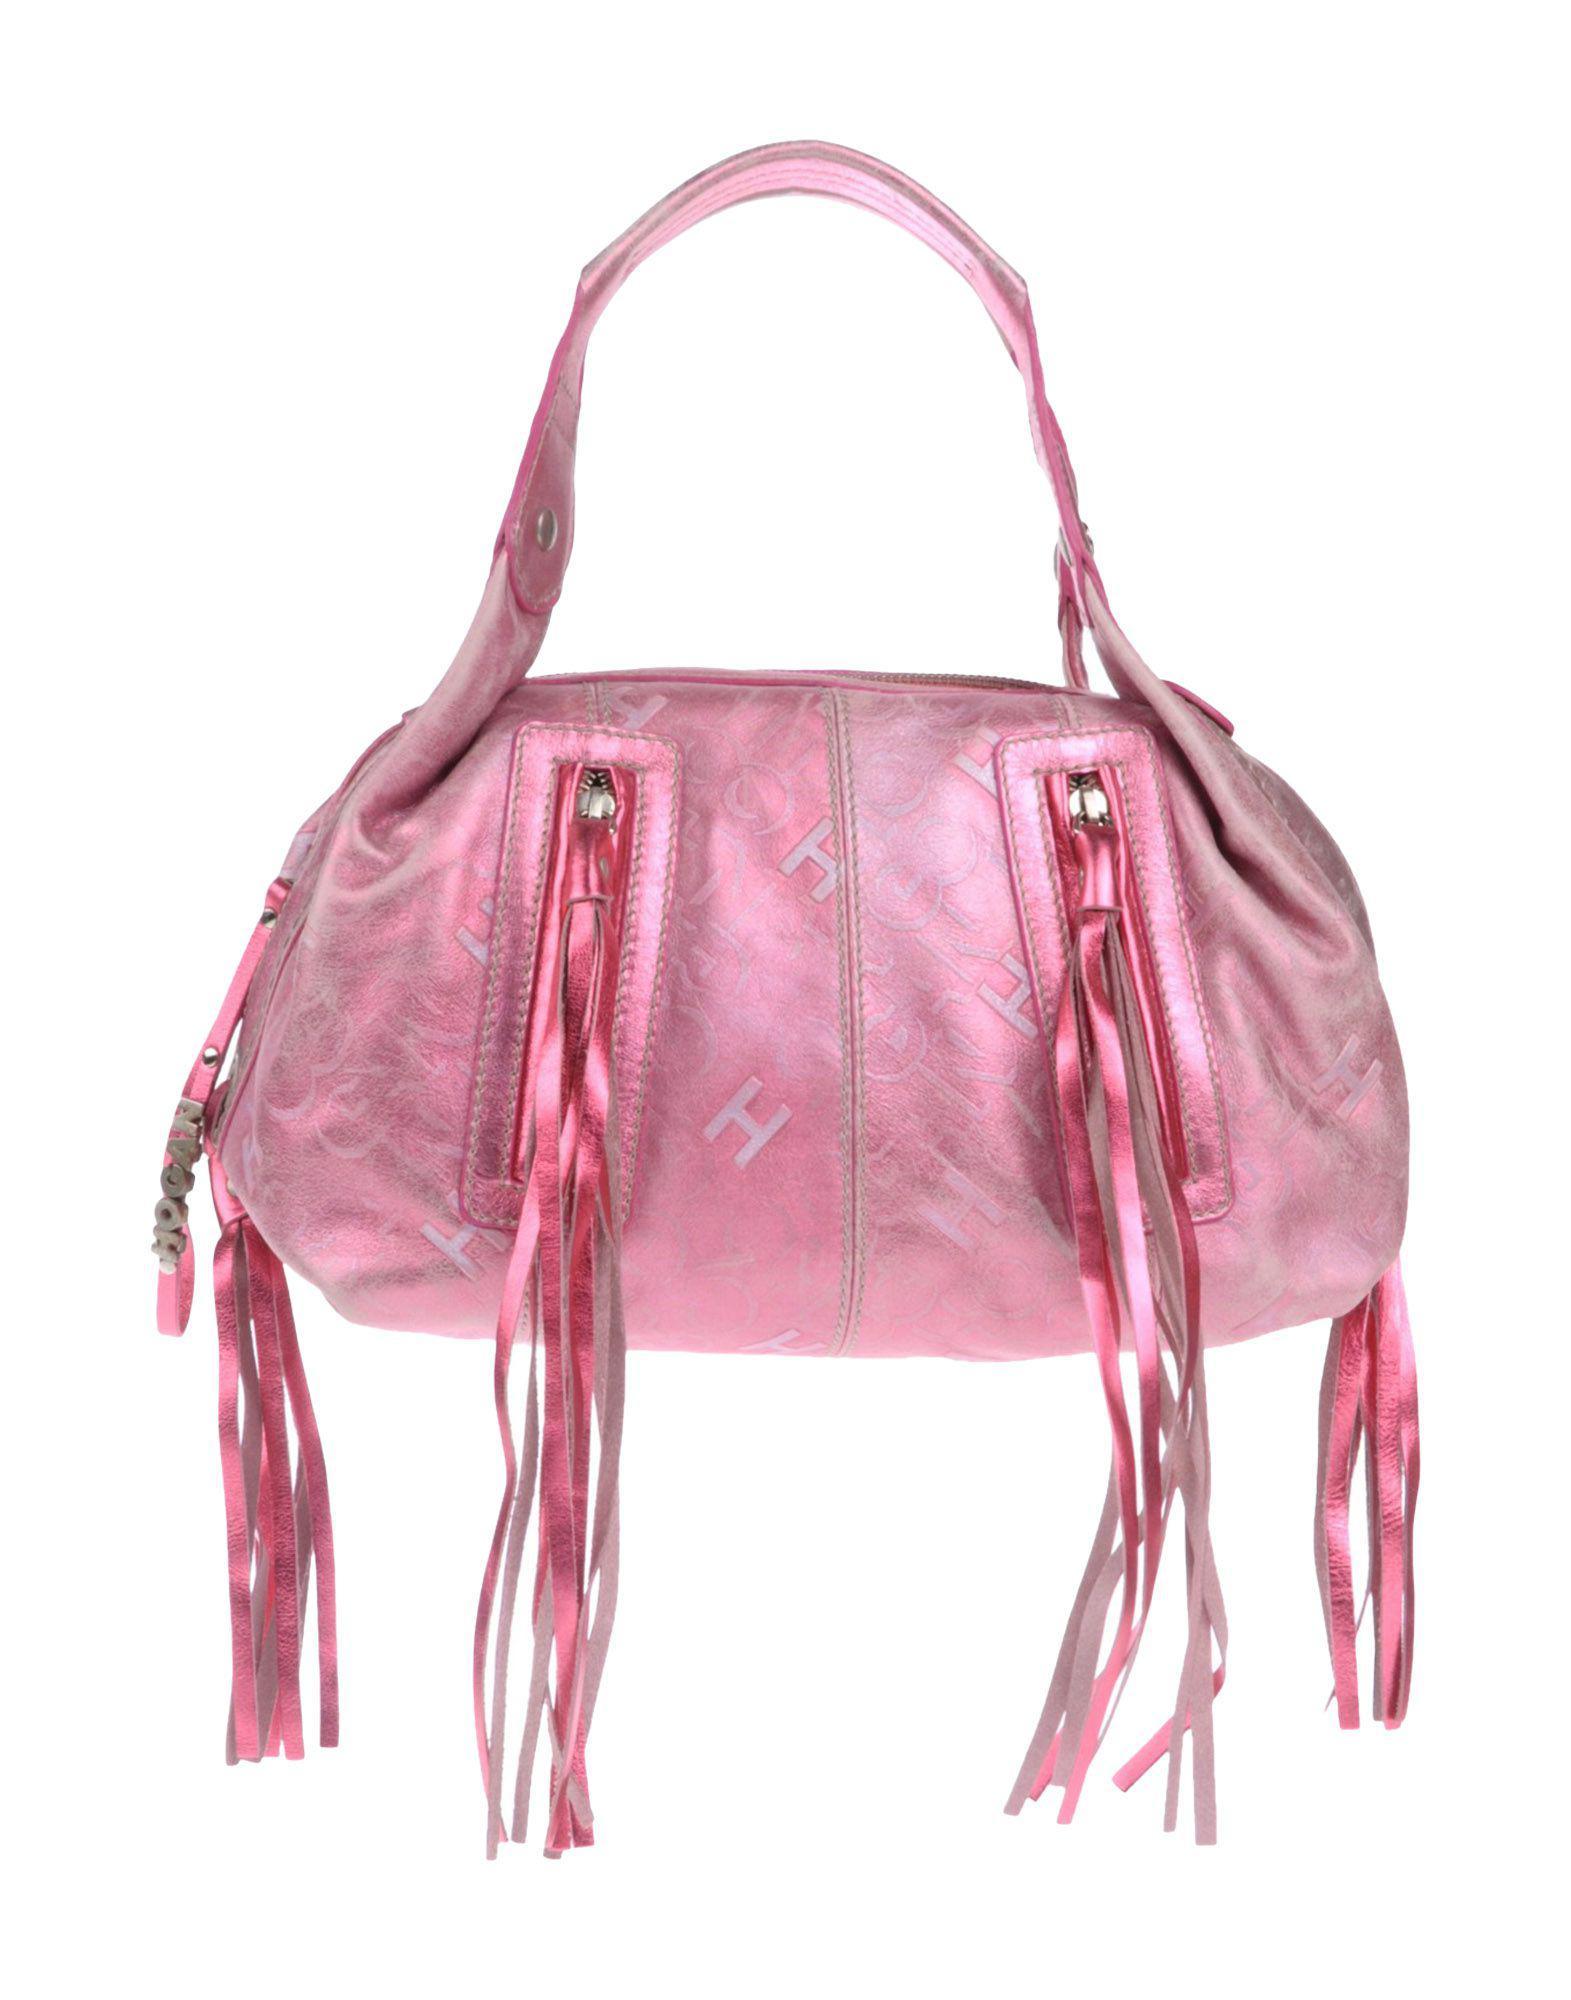 811056dab76 Lyst - Hogan Handbag in Pink